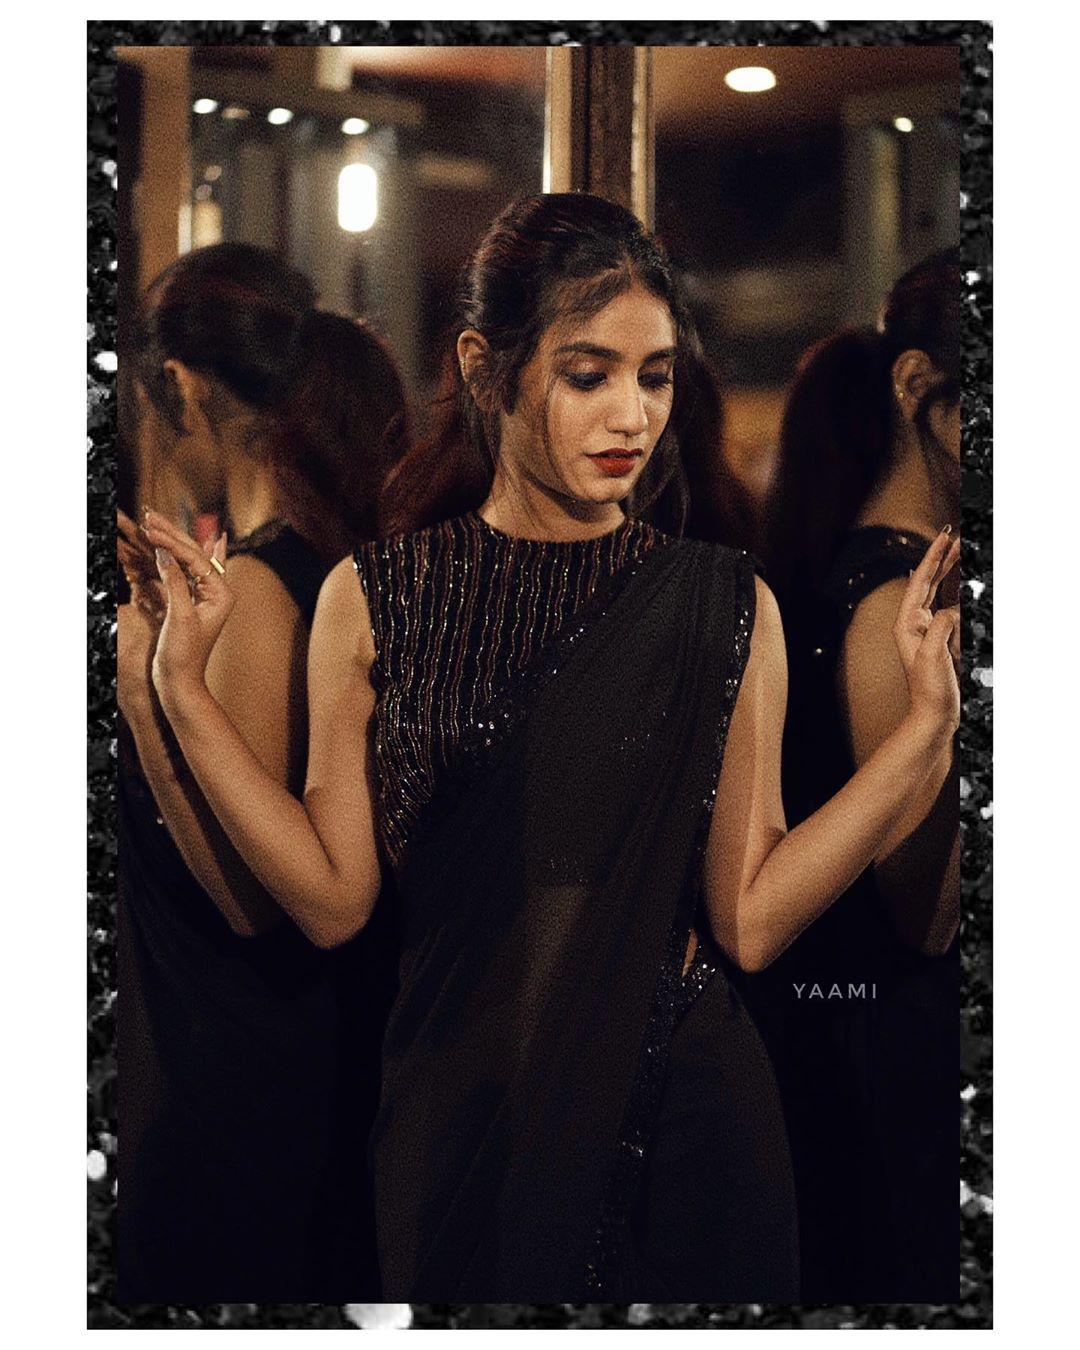 Priya Prakash Varrier is Making Heads Turn